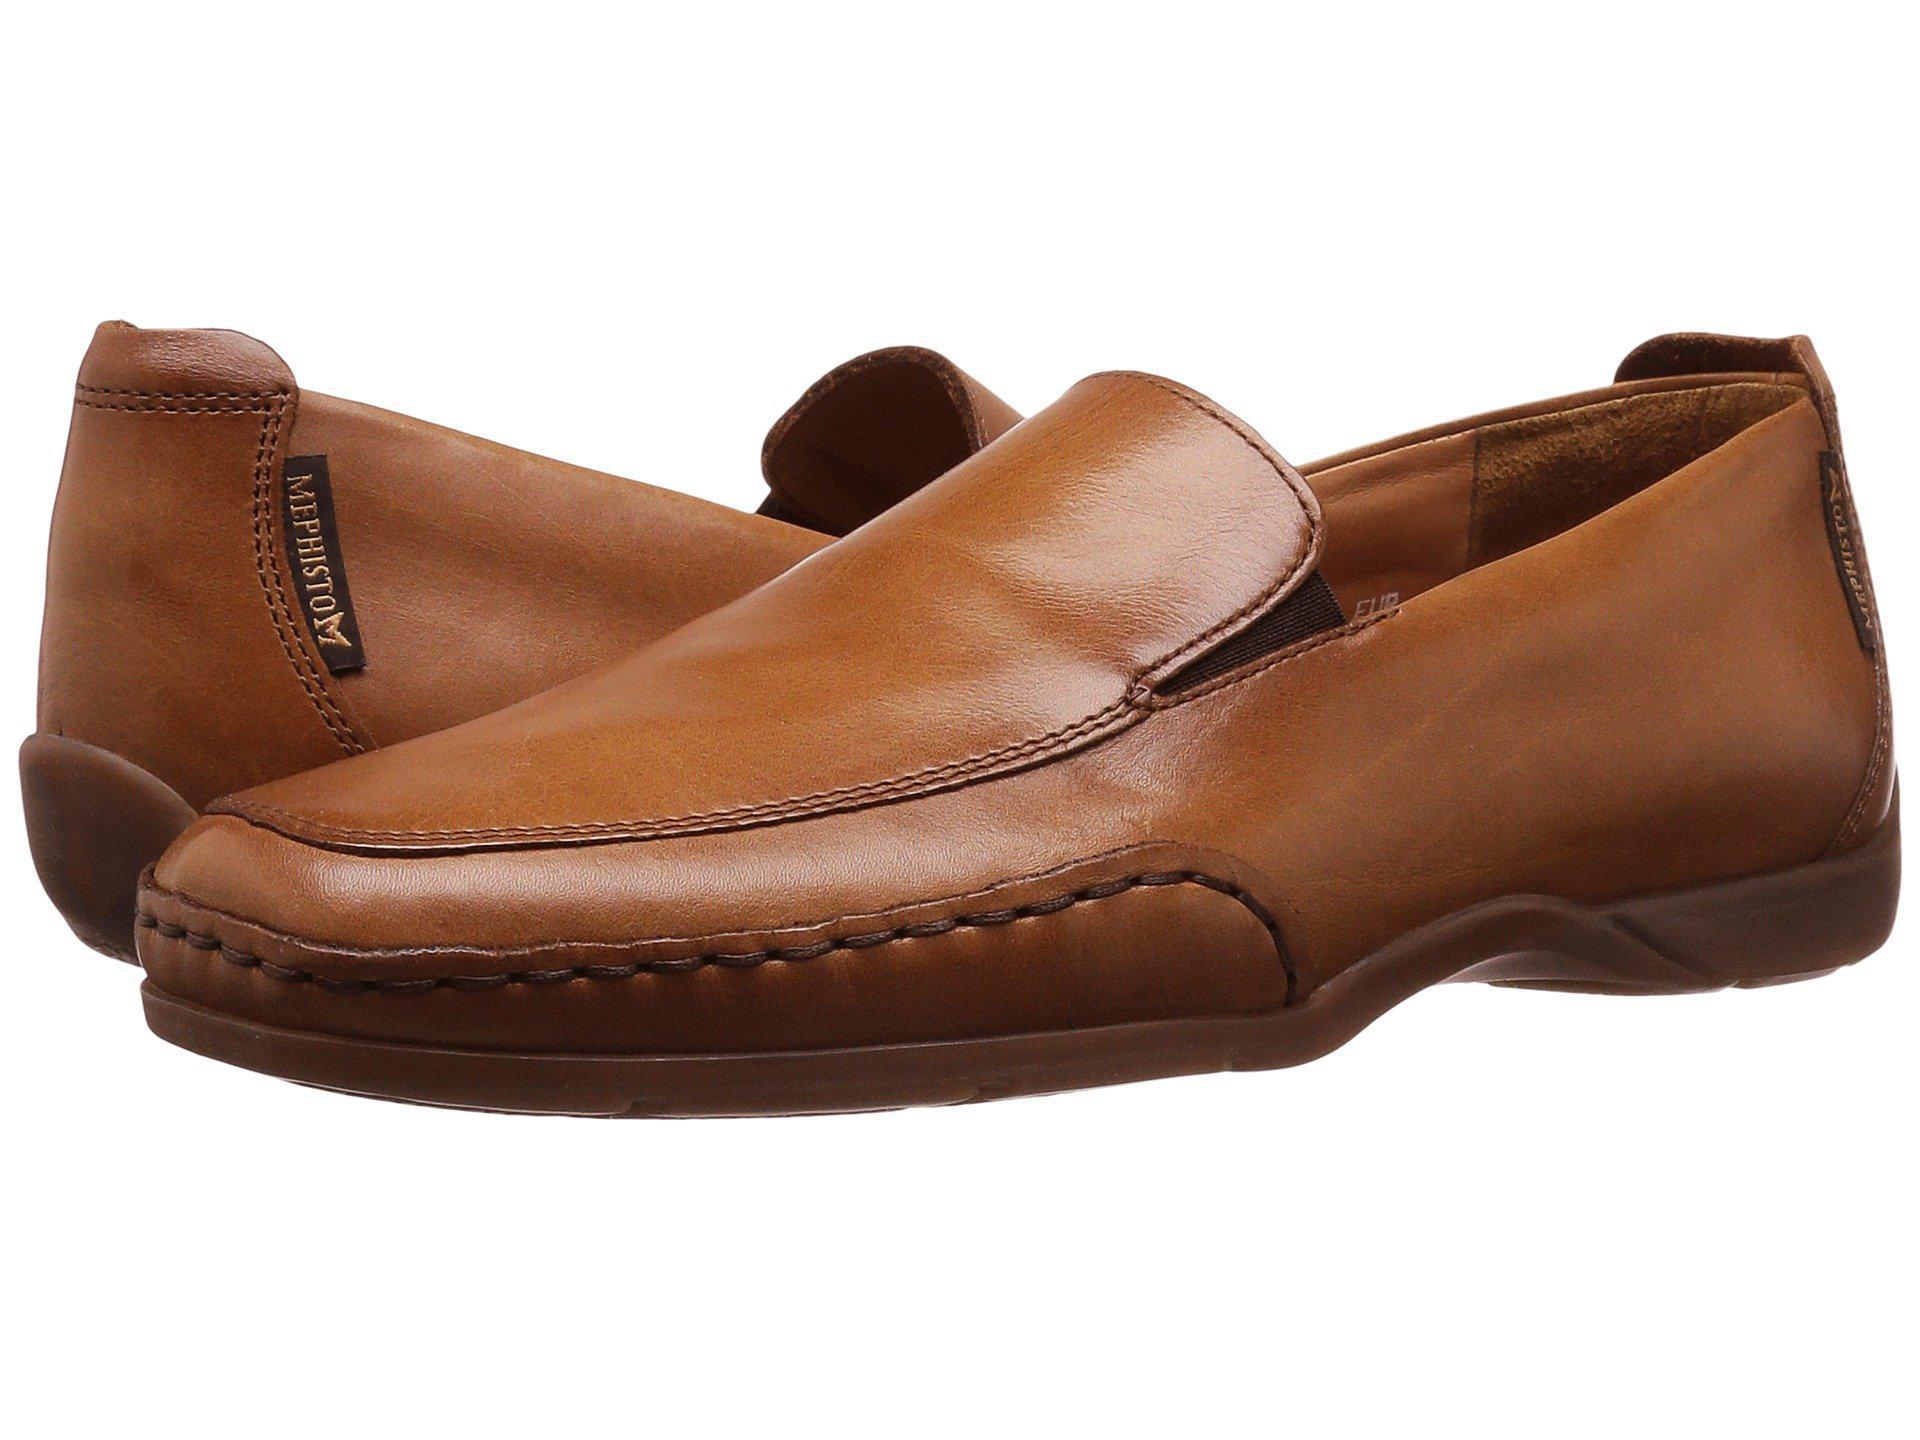 65e1fe4c1f6 Lyst - Mephisto Edlef (hazelnut Palace) Men s Slip On Shoes in Brown ...